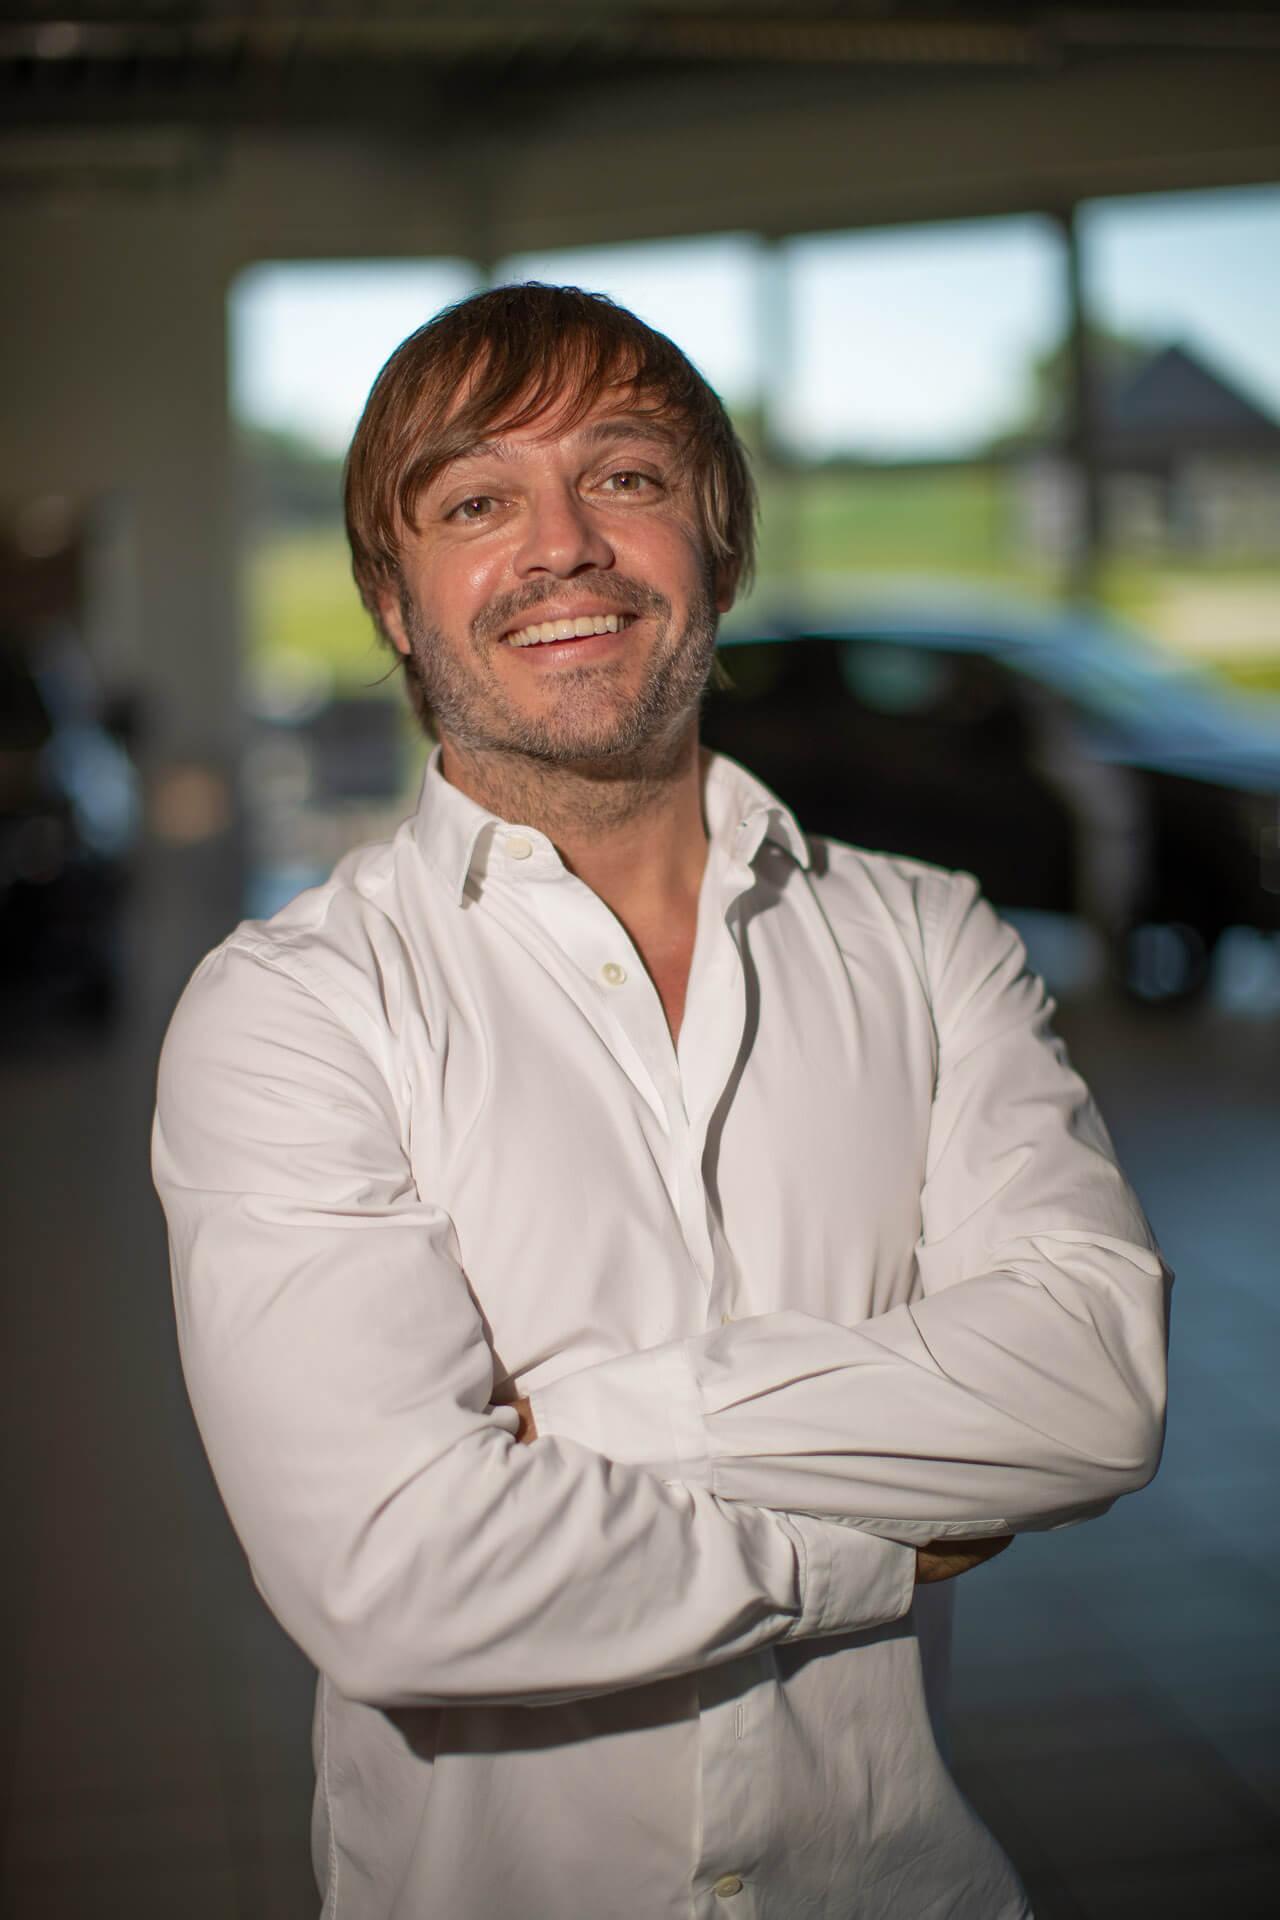 Markus Hager